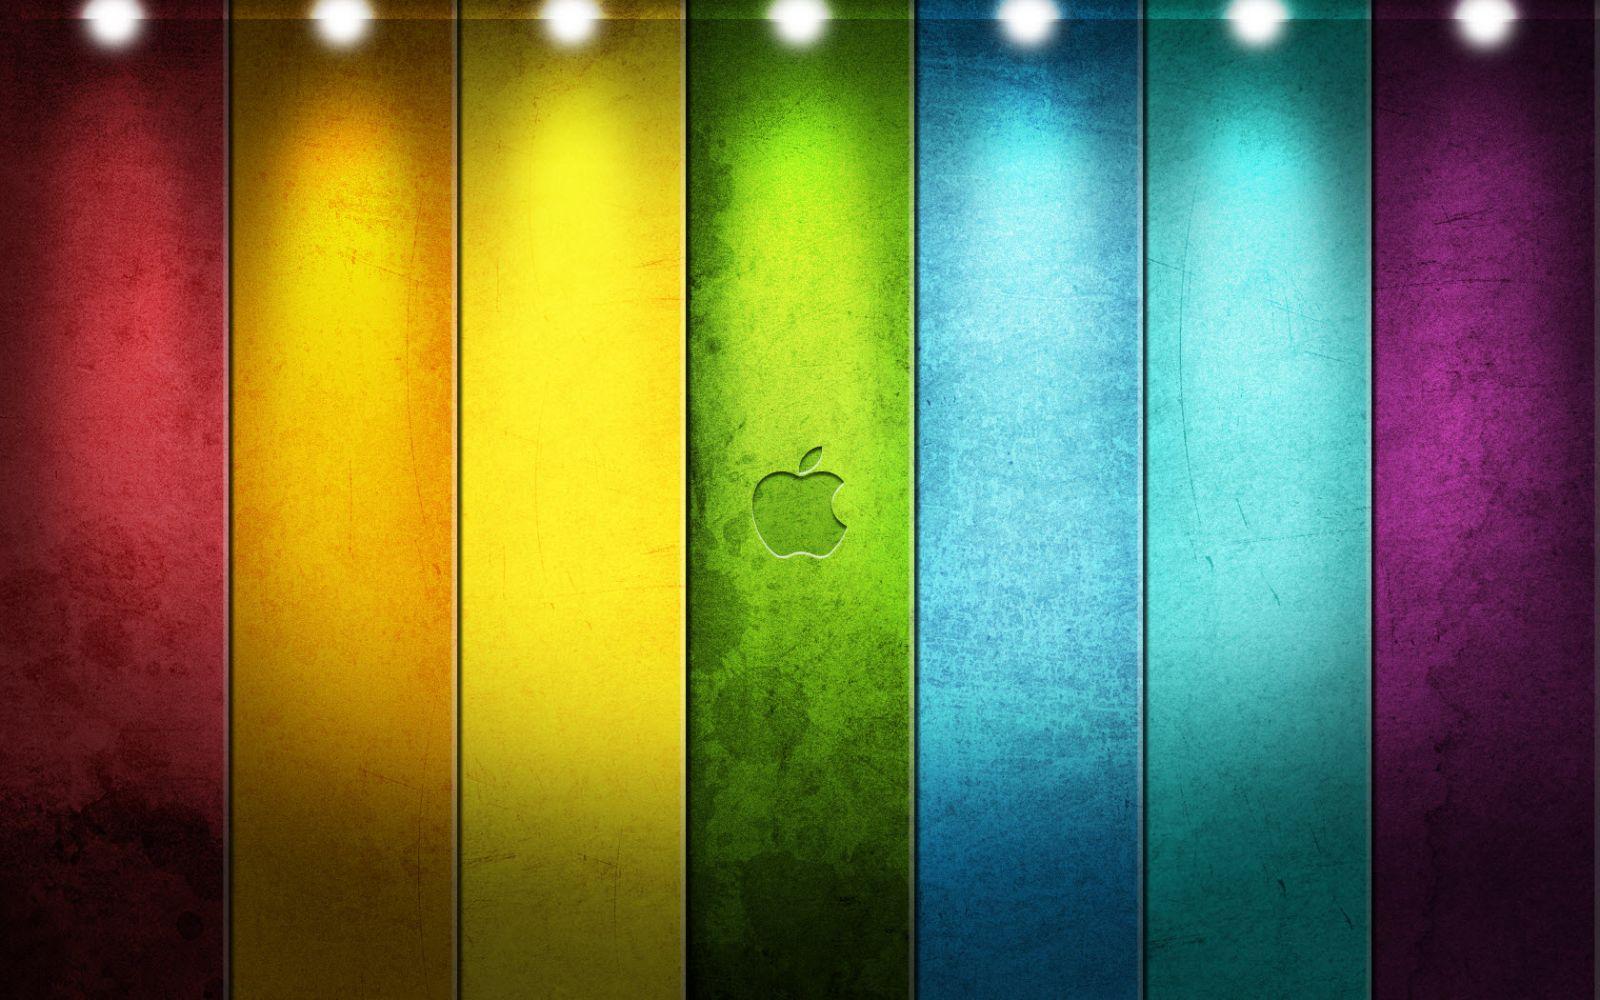 Iphone wallpaper quiz - Apple Iphone Quiz